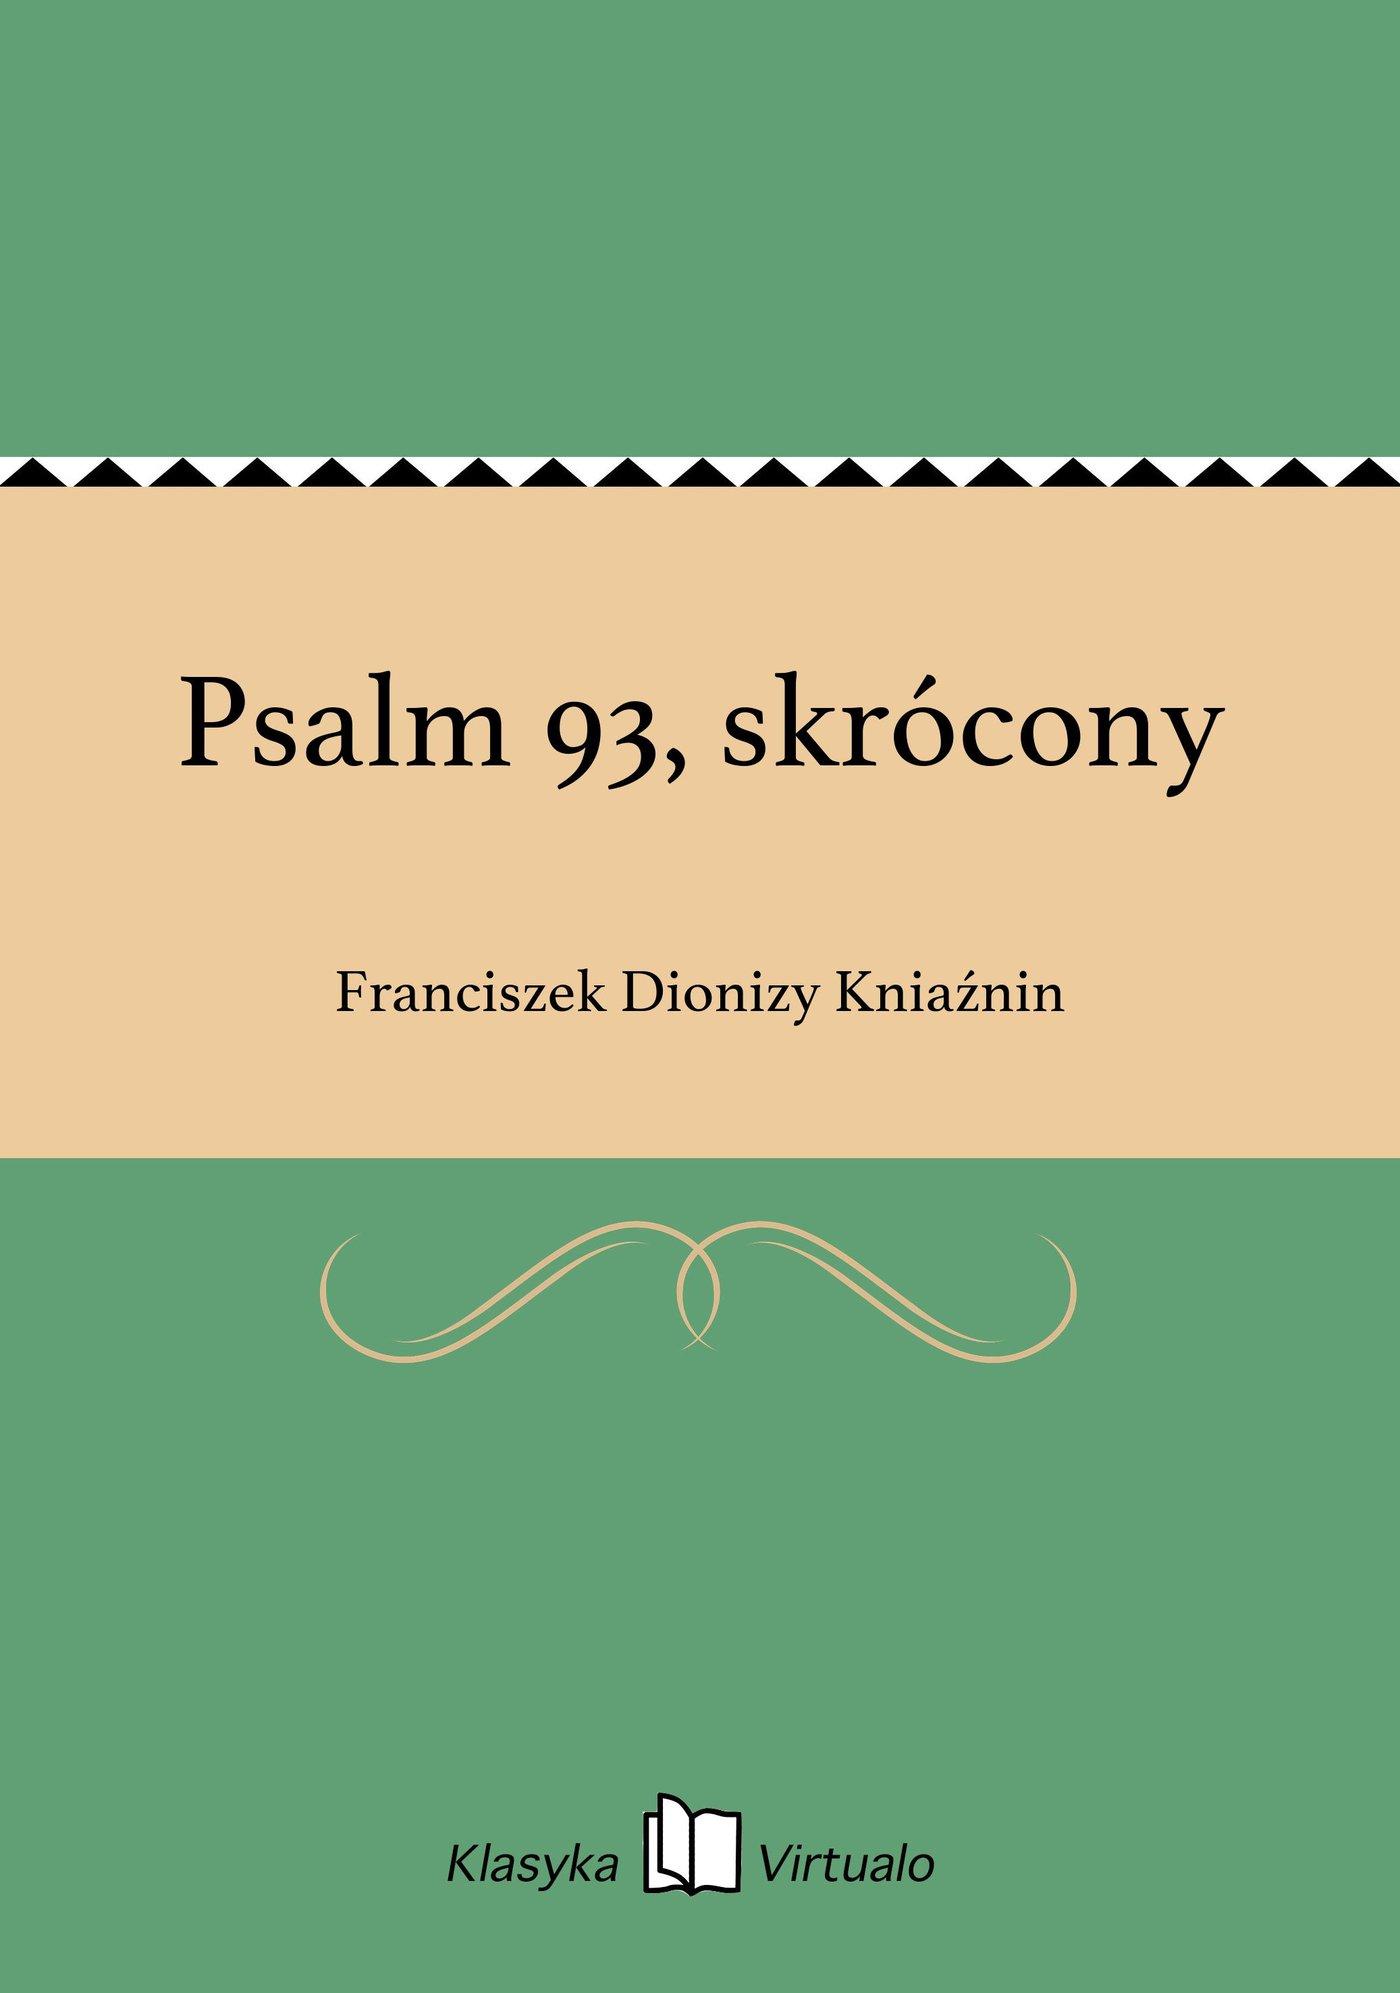 Psalm 93, skrócony - Ebook (Książka EPUB) do pobrania w formacie EPUB